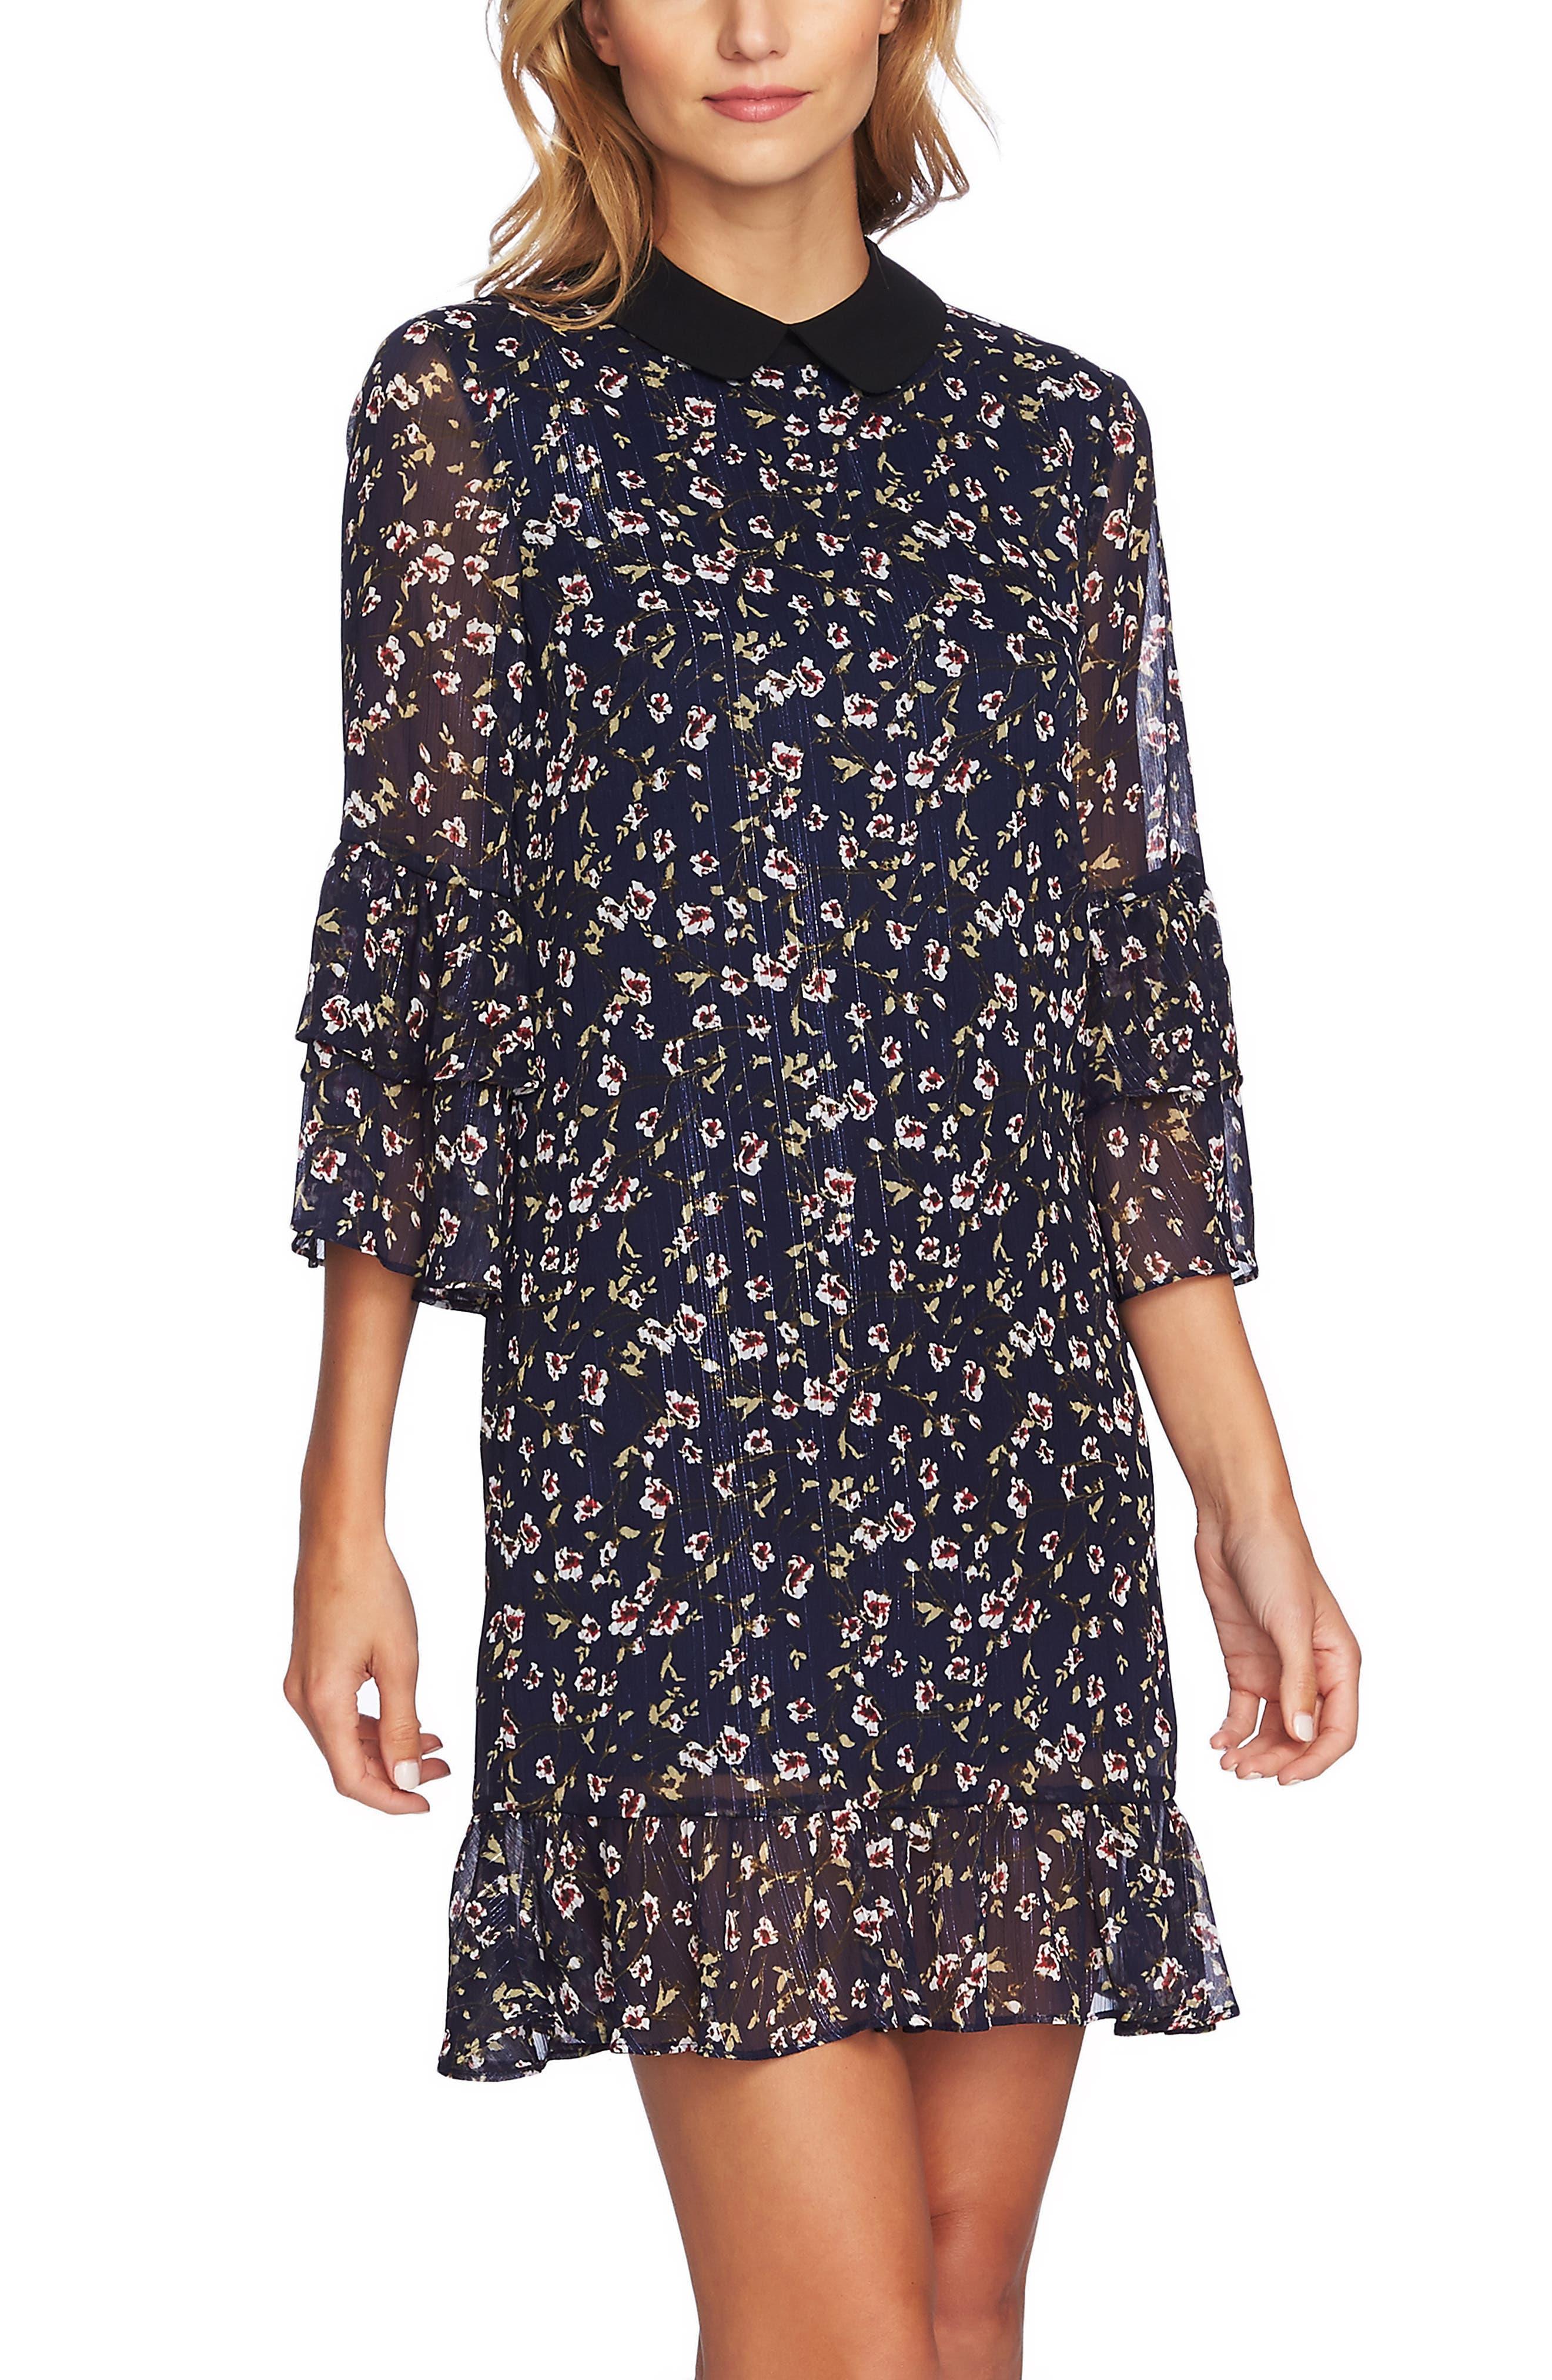 Festive Metallic Stripe Floral Ruffle Dress,                             Alternate thumbnail 4, color,                             MIDNIGHT BLOOM